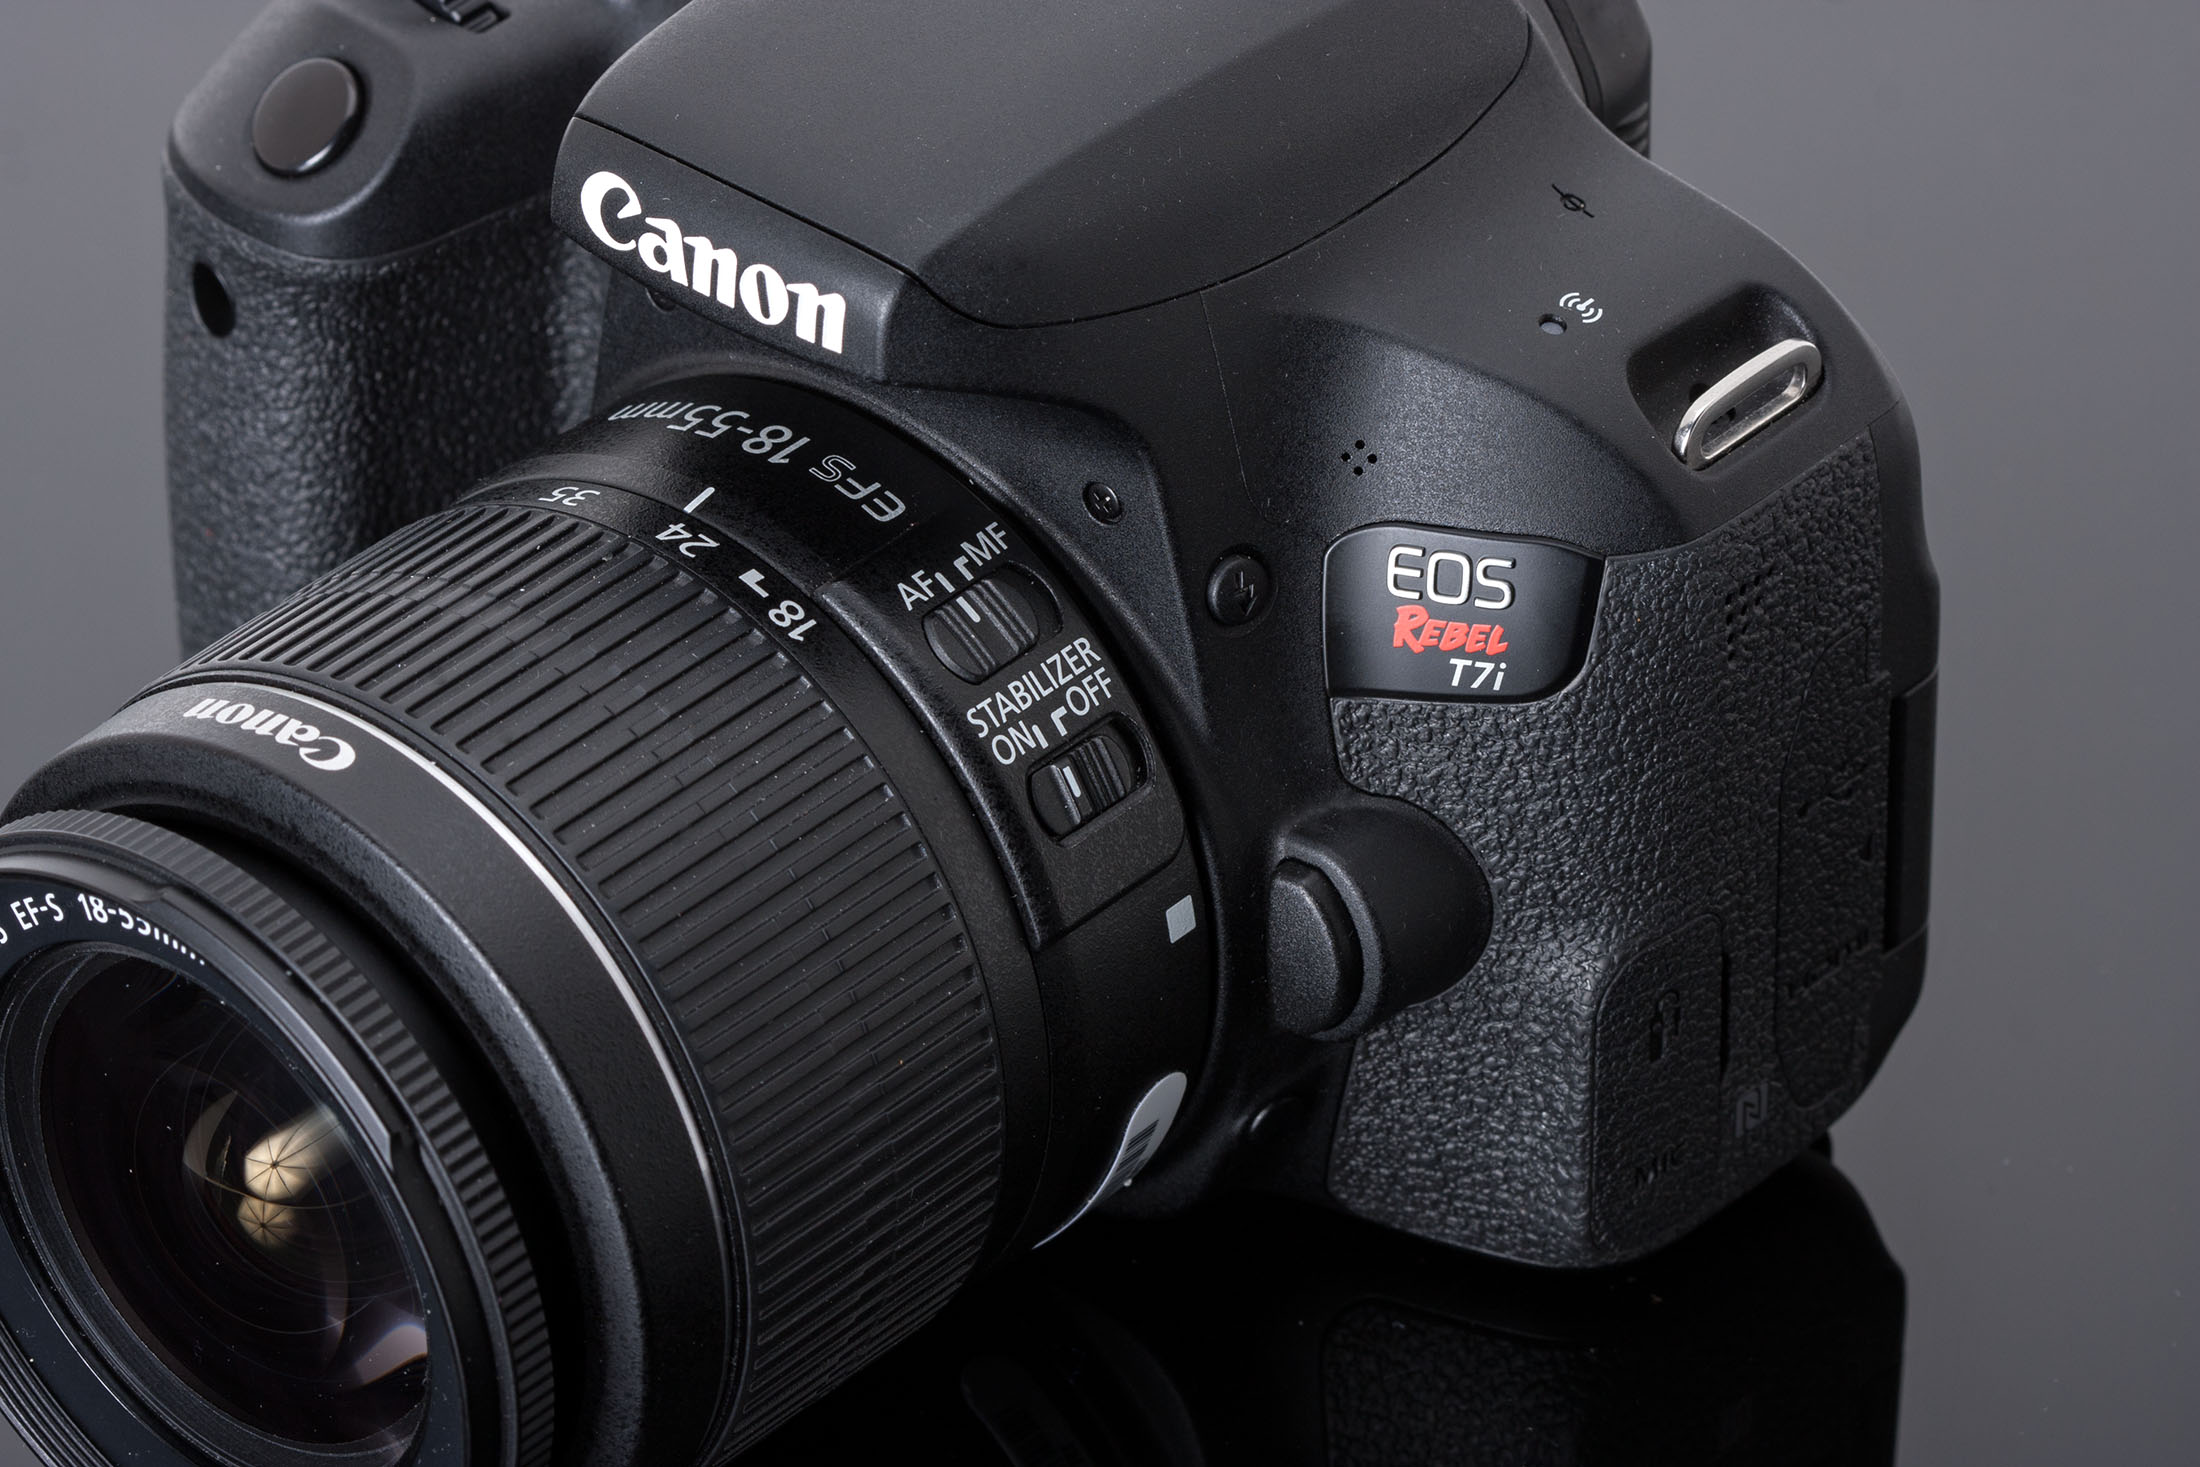 canon-eos-t7i